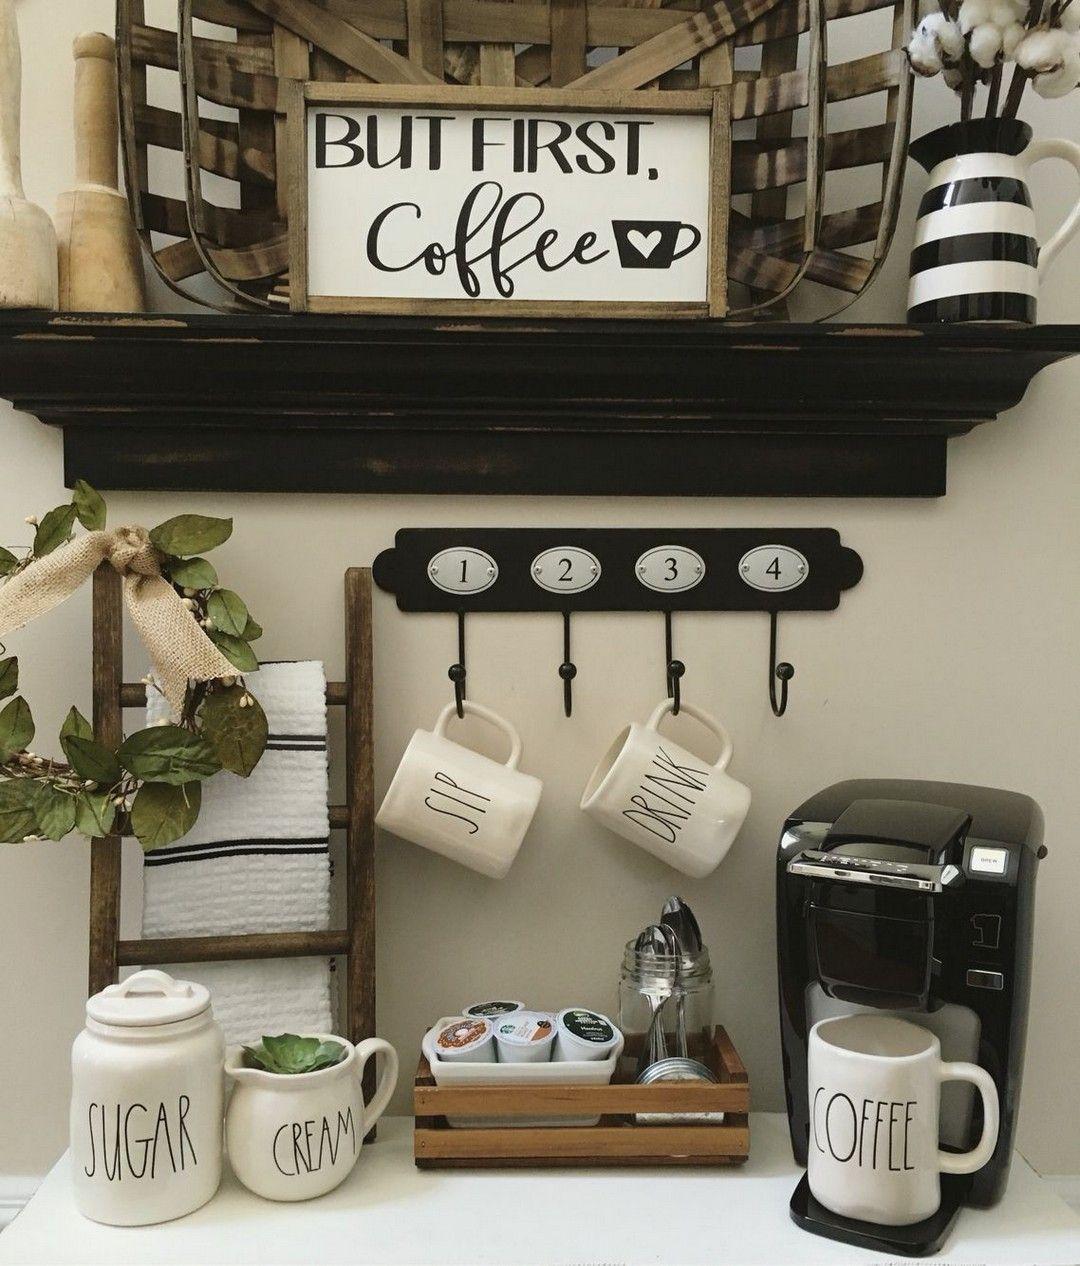 10 Finest Diy Coffee Bar Decor Ideas You Need To See Coffee Bar Home Diy Coffee Bar Coffee Bar Design